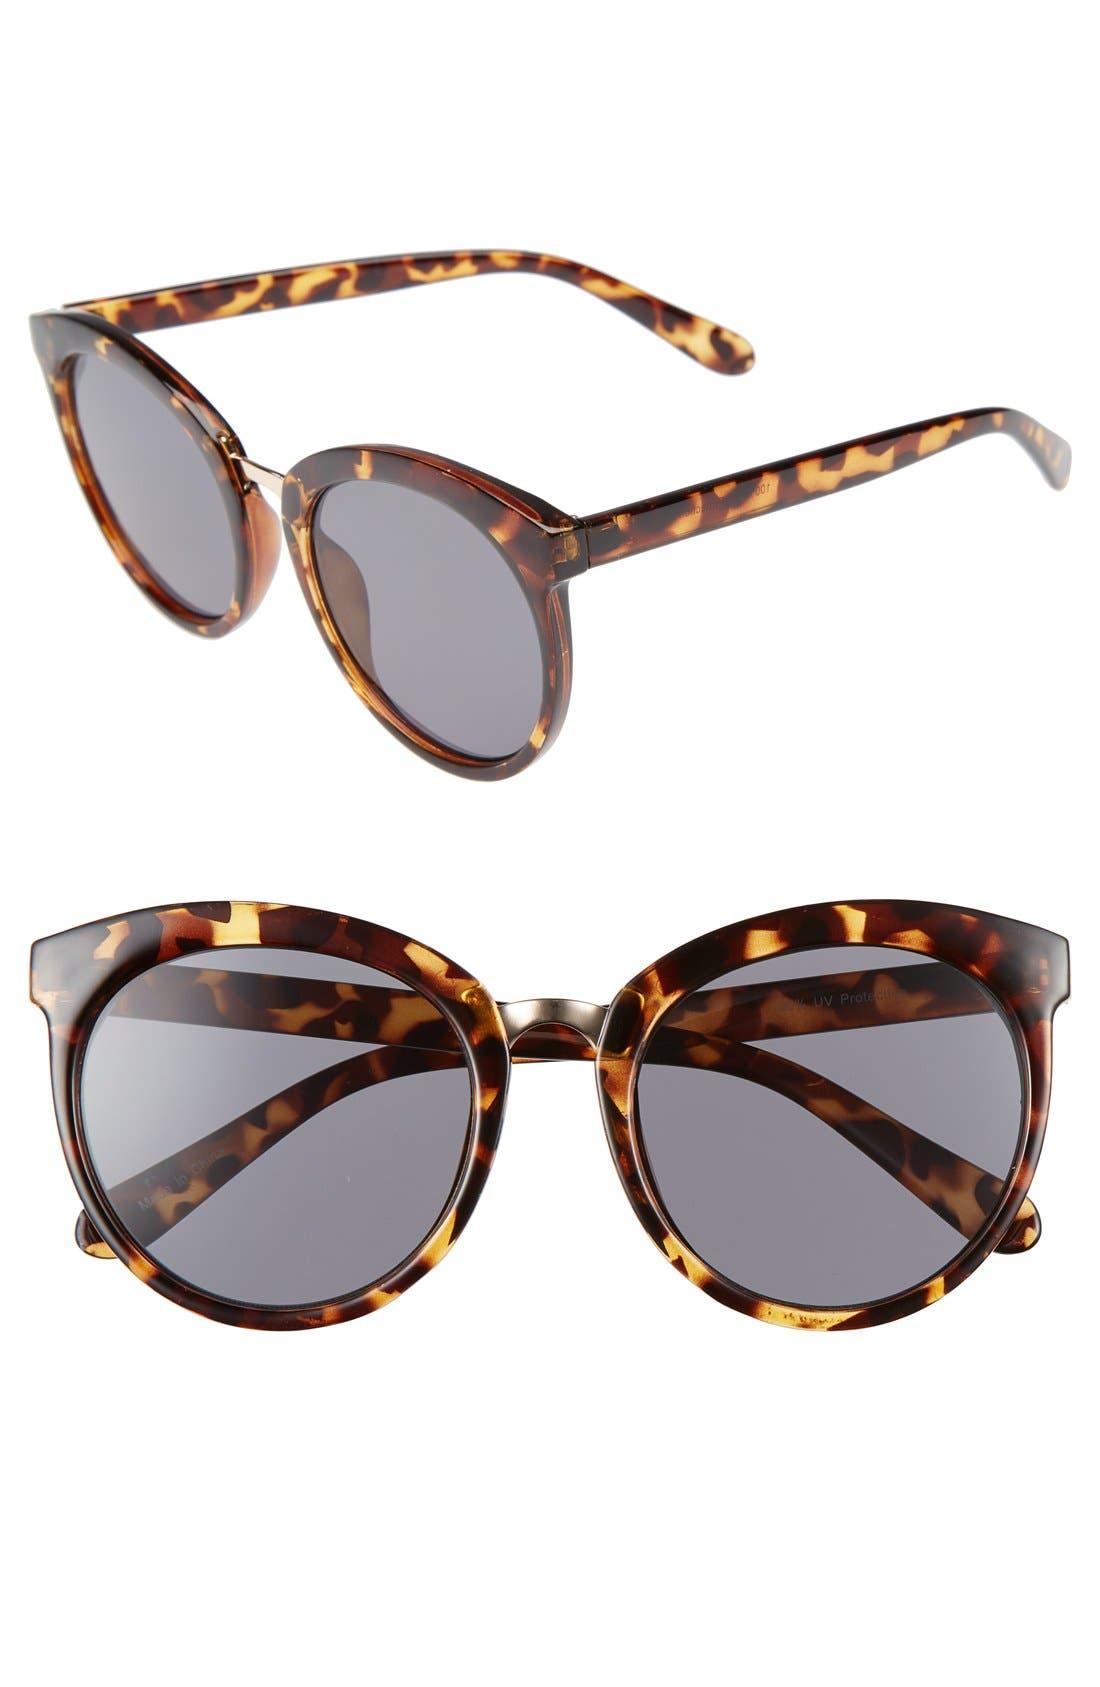 BP 'Lookout' 52mm Round Sunglasses,                             Main thumbnail 1, color,                             210